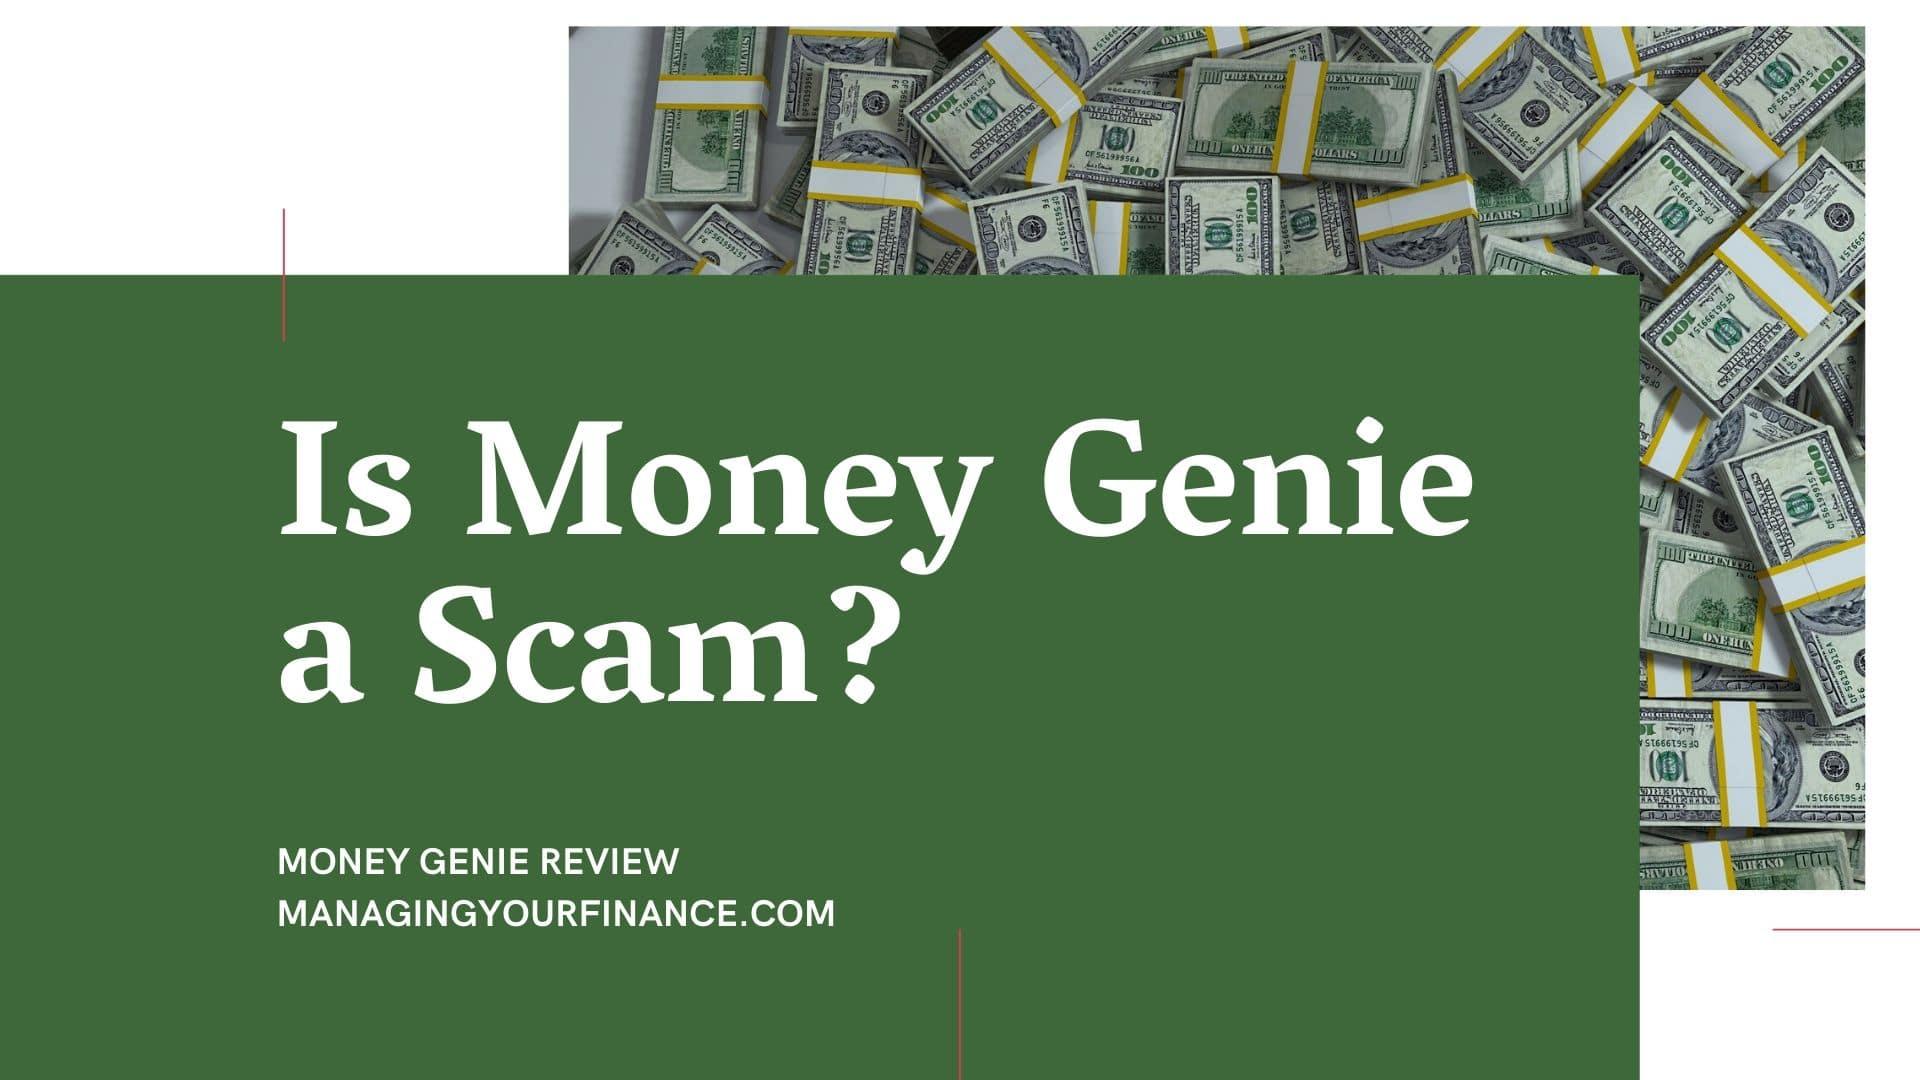 Money Genie a scam